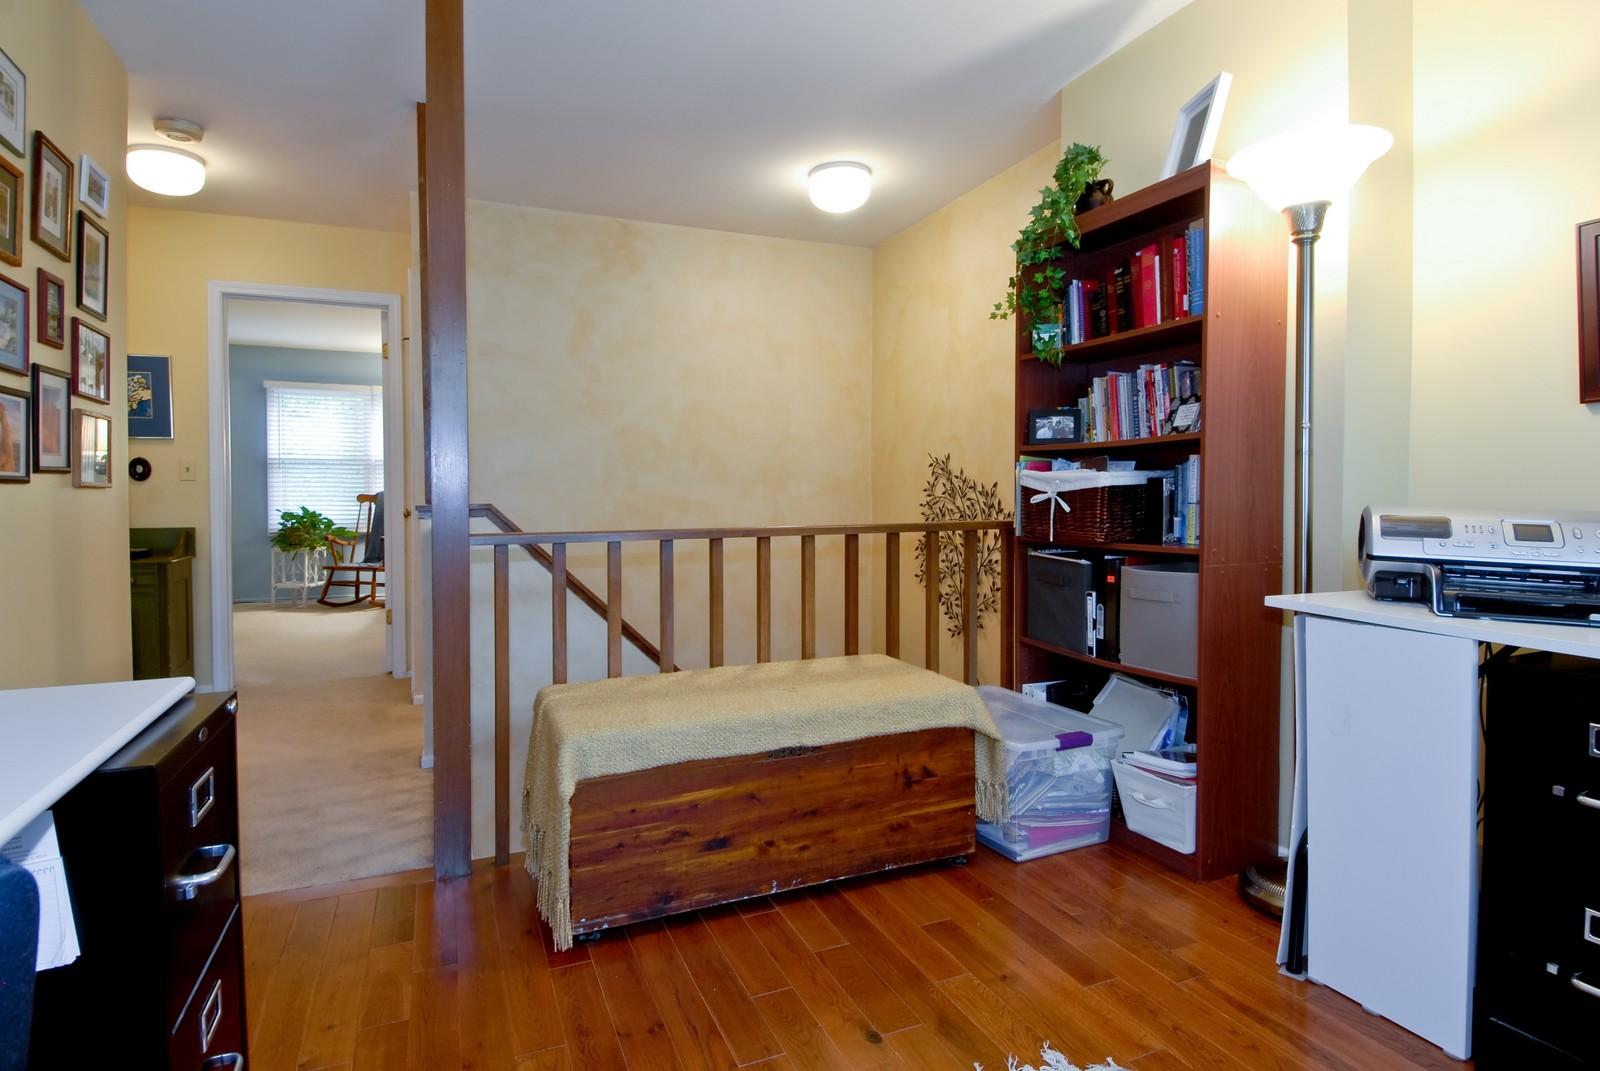 Real Estate Photography - 55 White Oak Cir, St Charles, IL, 60174 - Loft View B